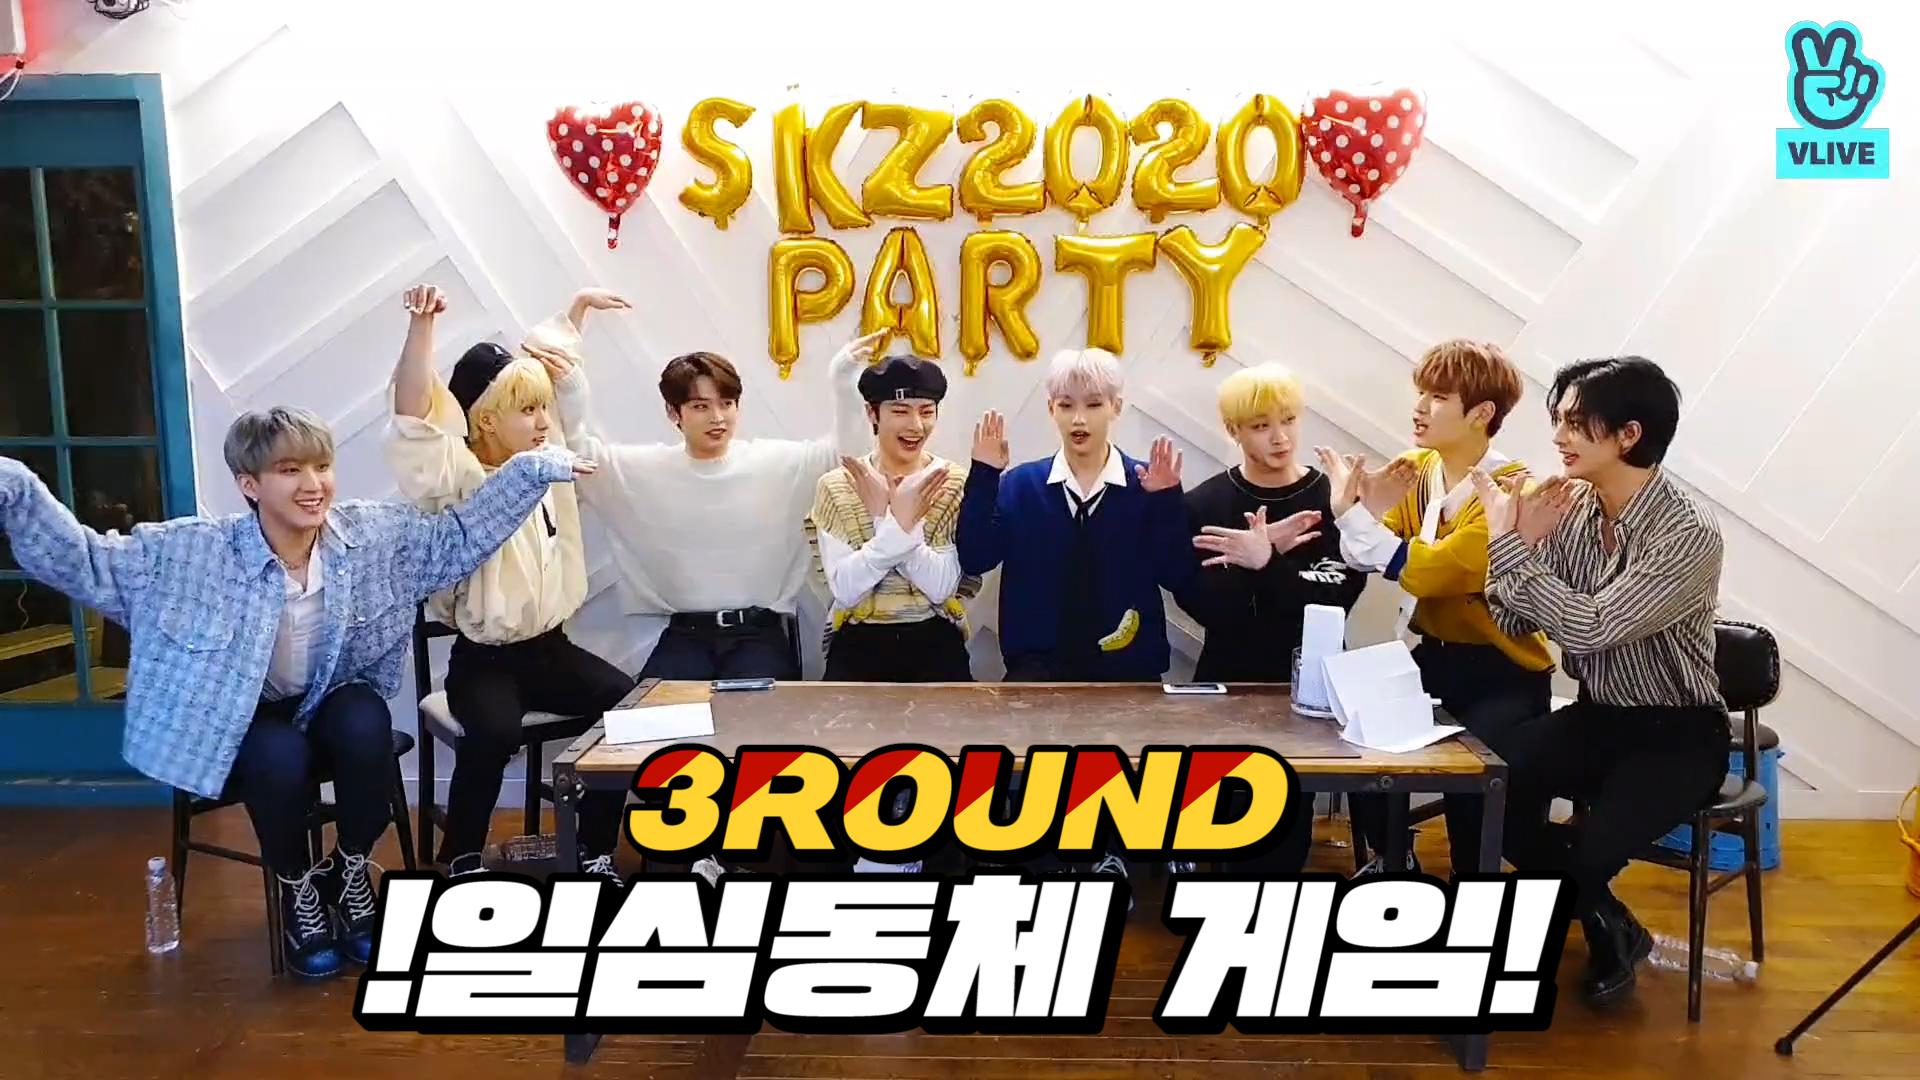 [Stray Kids] 우리키즈 귀여움으로 일심동체니까 정답 인정!!🙋♀️💕 (Stray Kids's quiz about their songs)